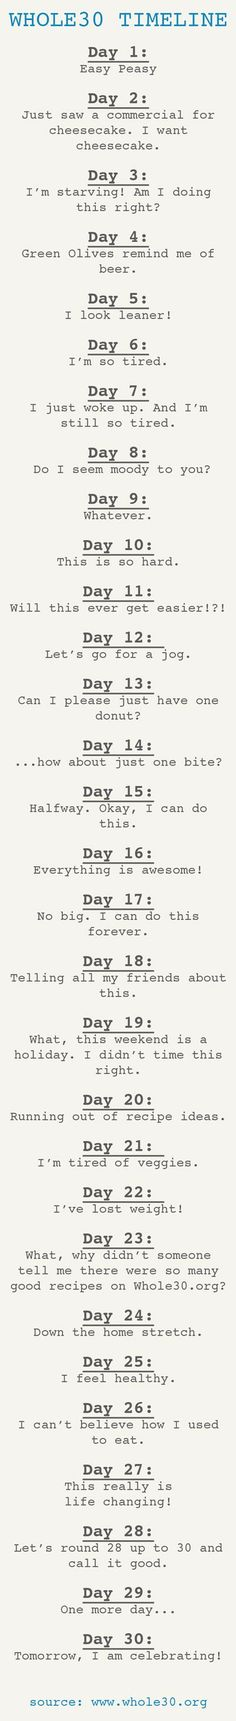 Whole30 Timeline